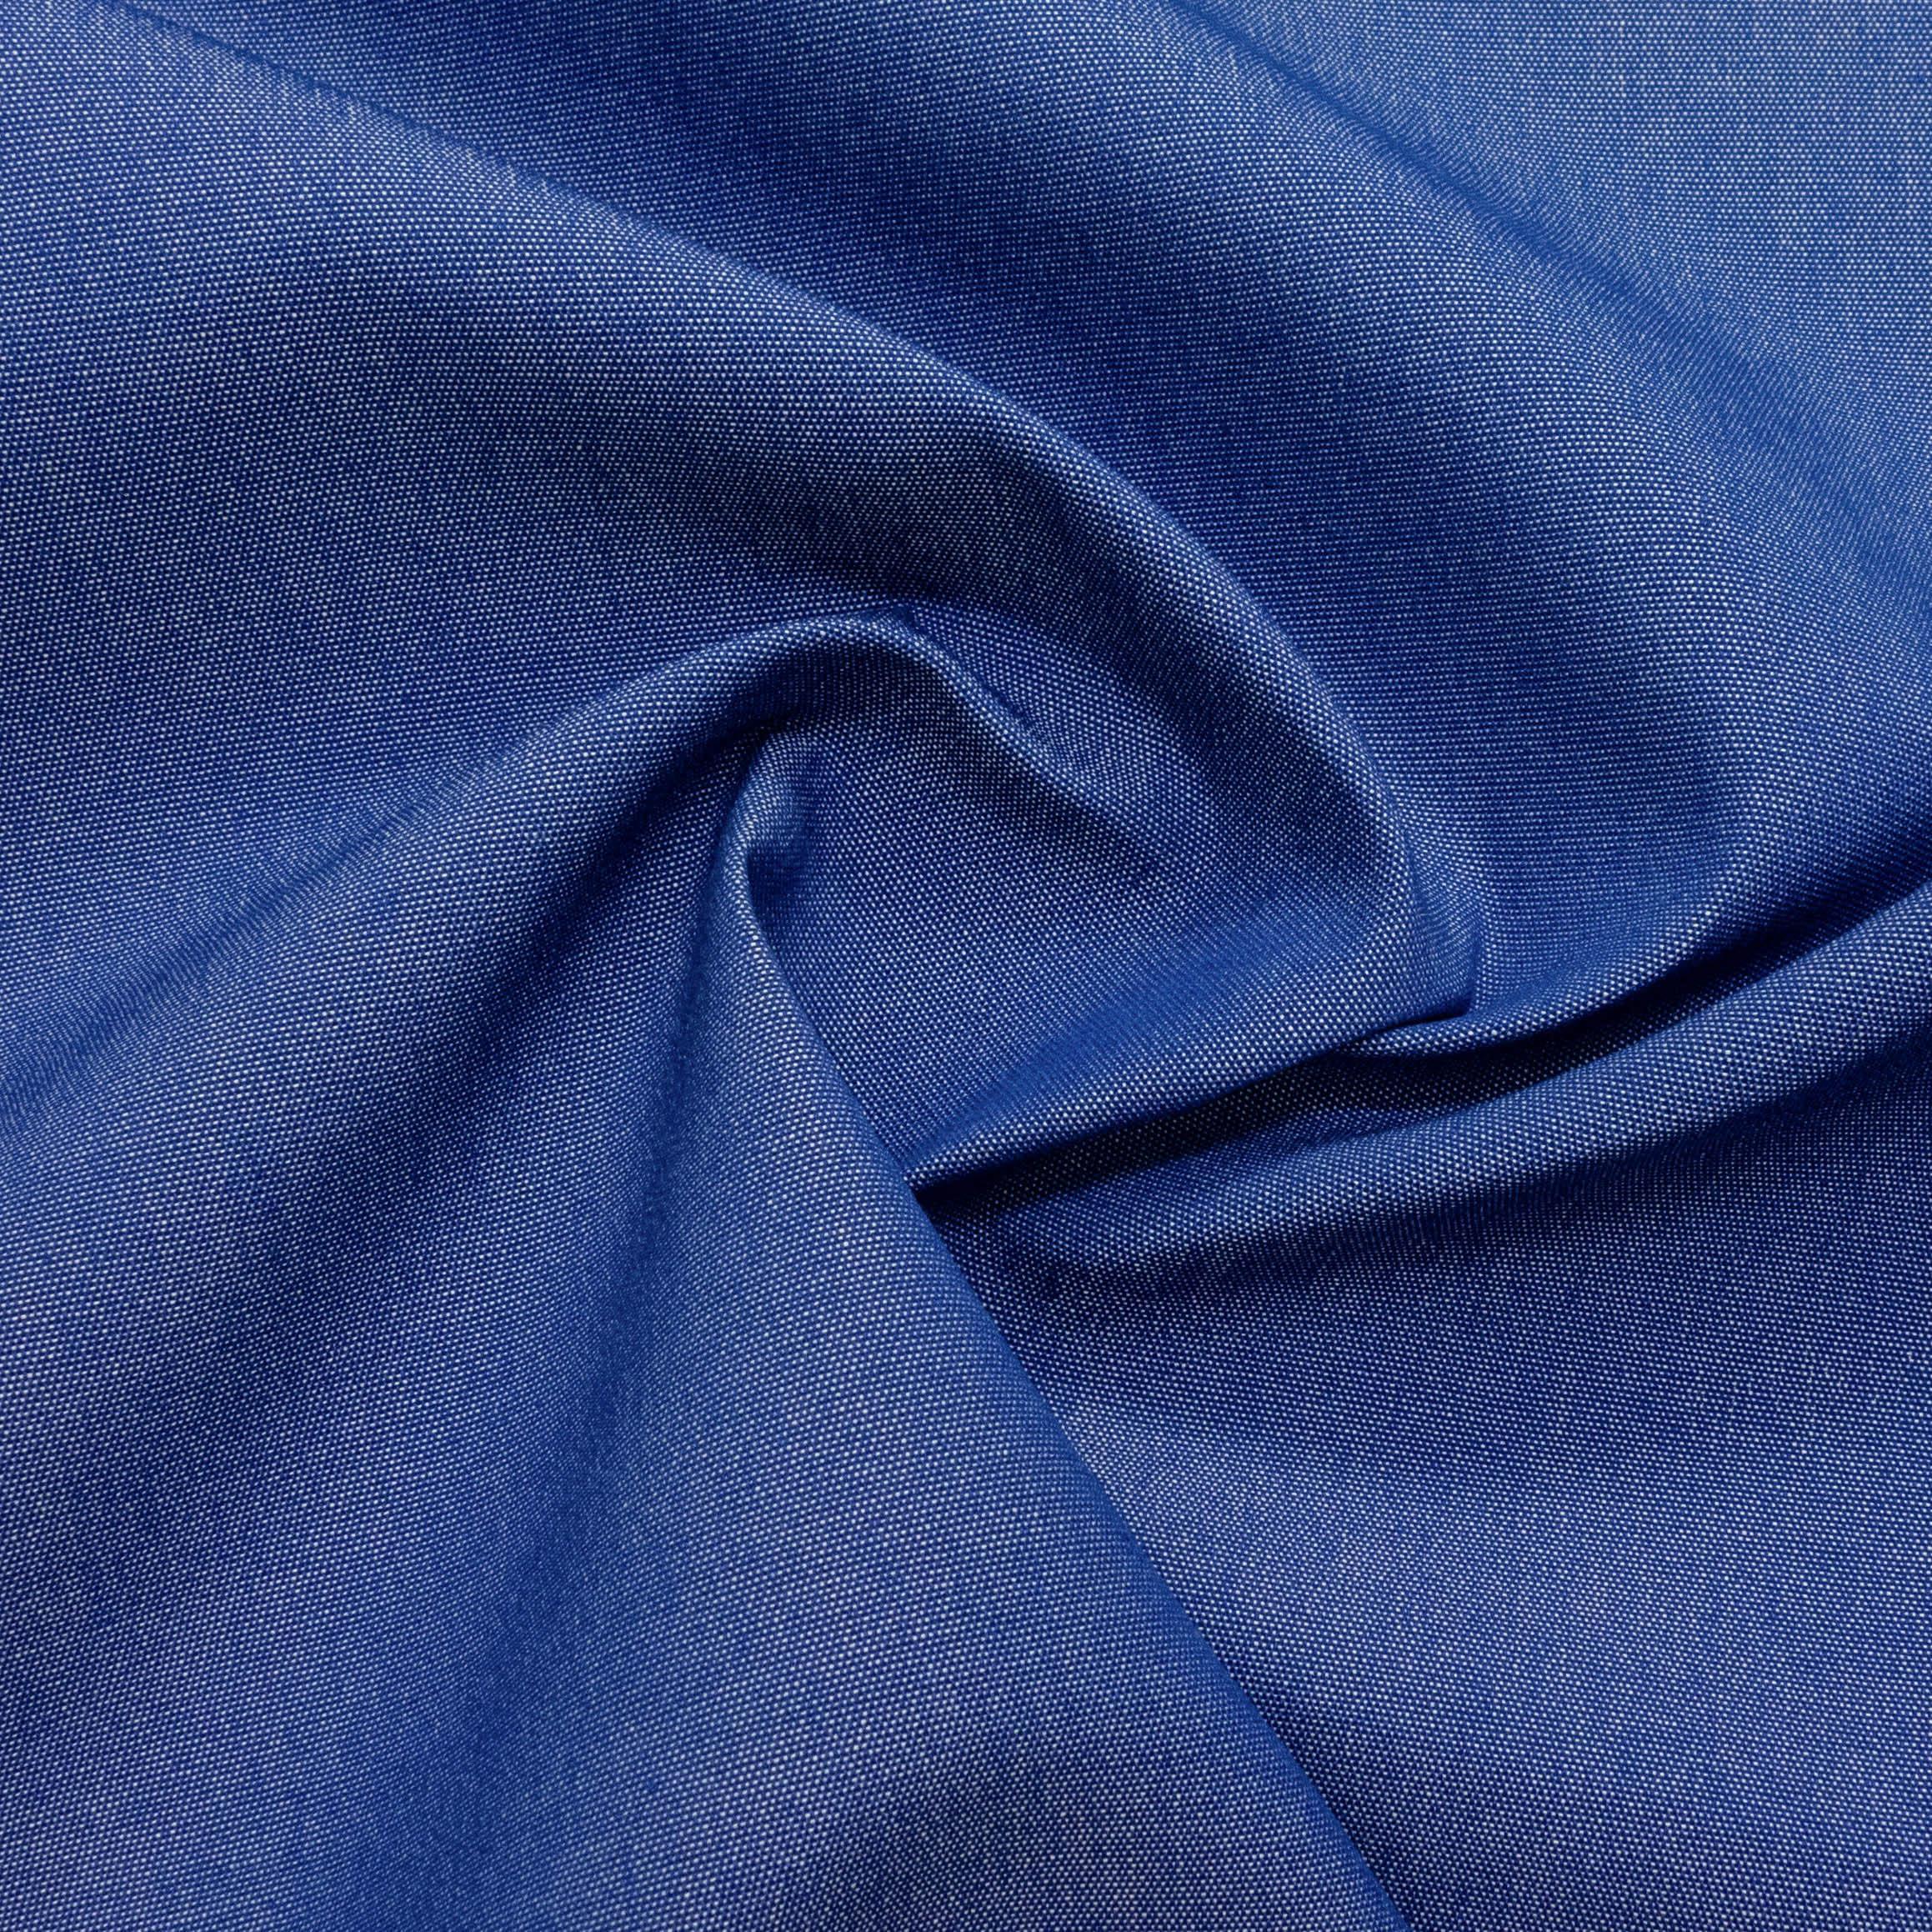 bicolor, Royalblau, Weiß